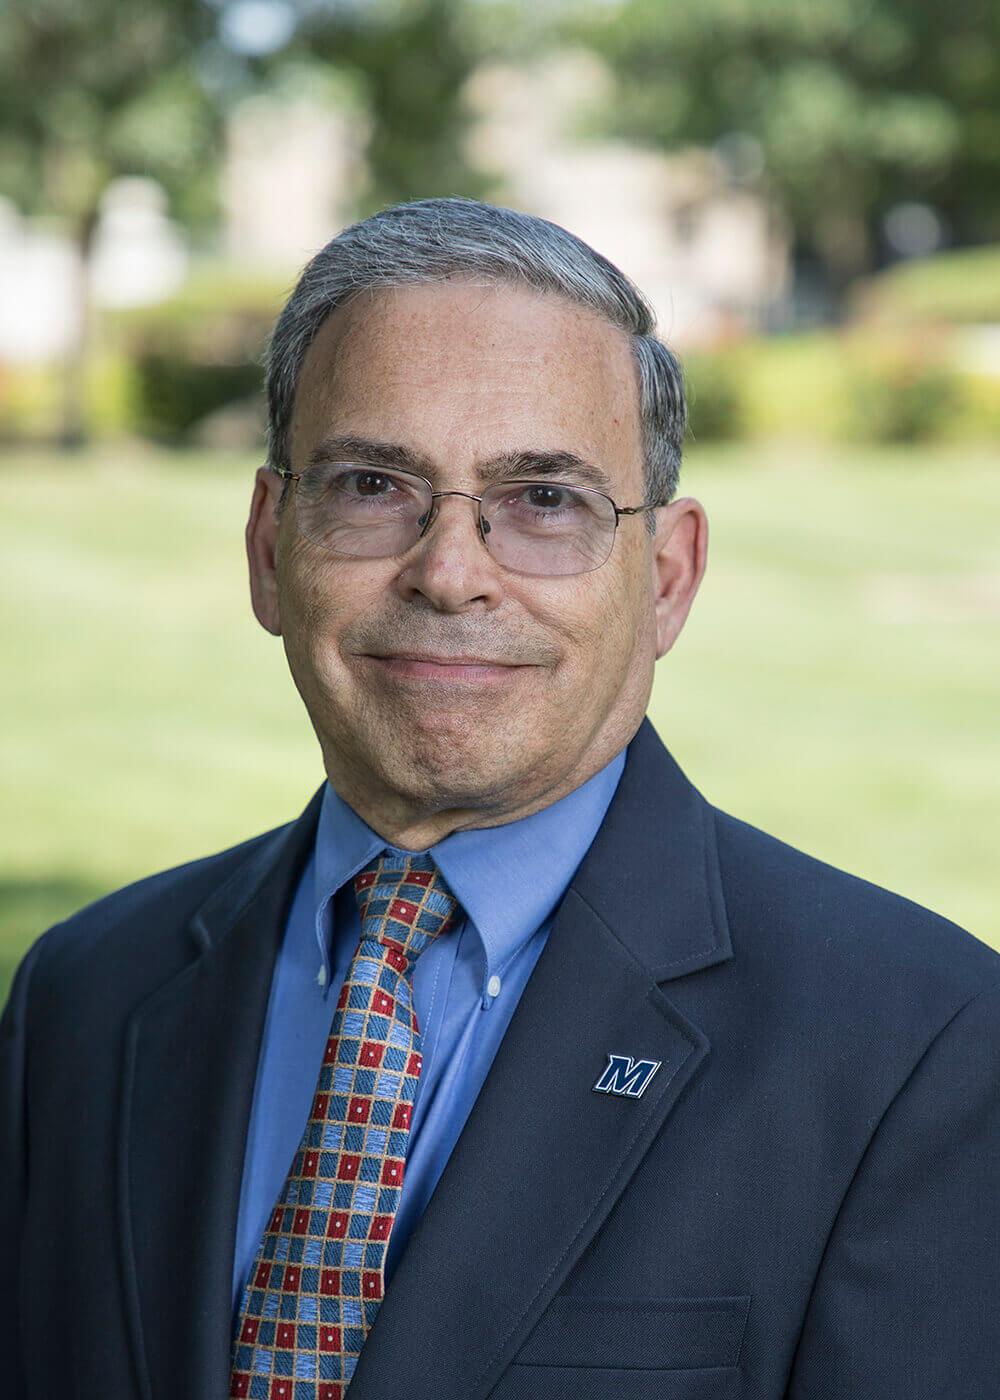 Thomas J. Michelli